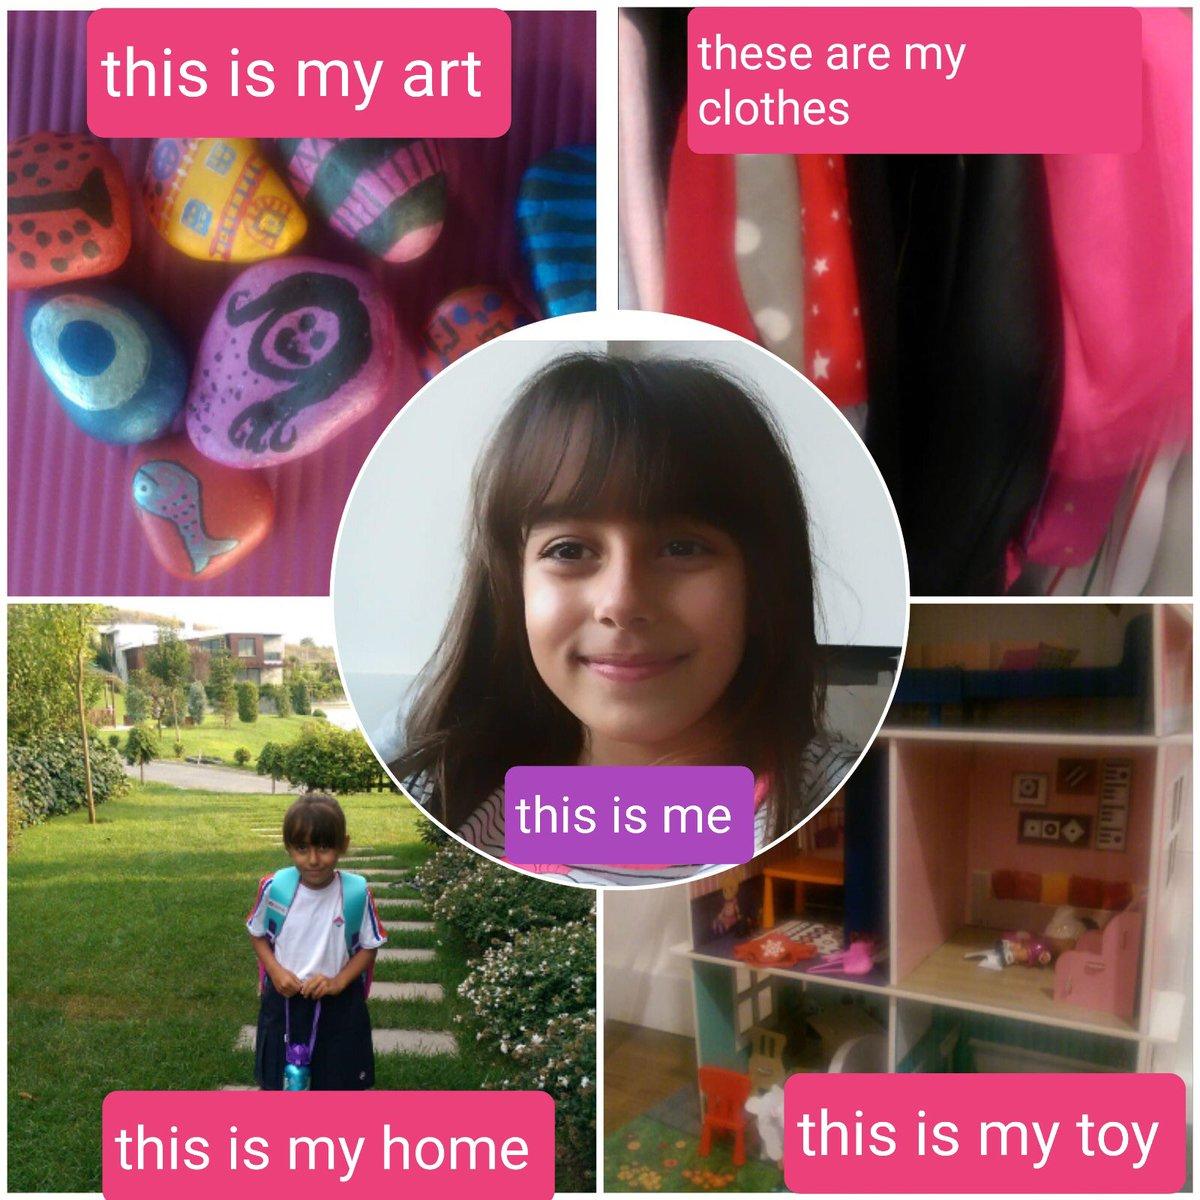 Doing homework is still fun for us! 📖 💻 Ayşe Ada is sharing with us how she does her homework every weekend!💯✨ #1stgrades #bilingual @ErkenCocukluk @bkmatthewbenton @HuruOner @DenizKCoskun @senoltopal77 @mesutcaglarr https://t.co/zoZ27iYm2l